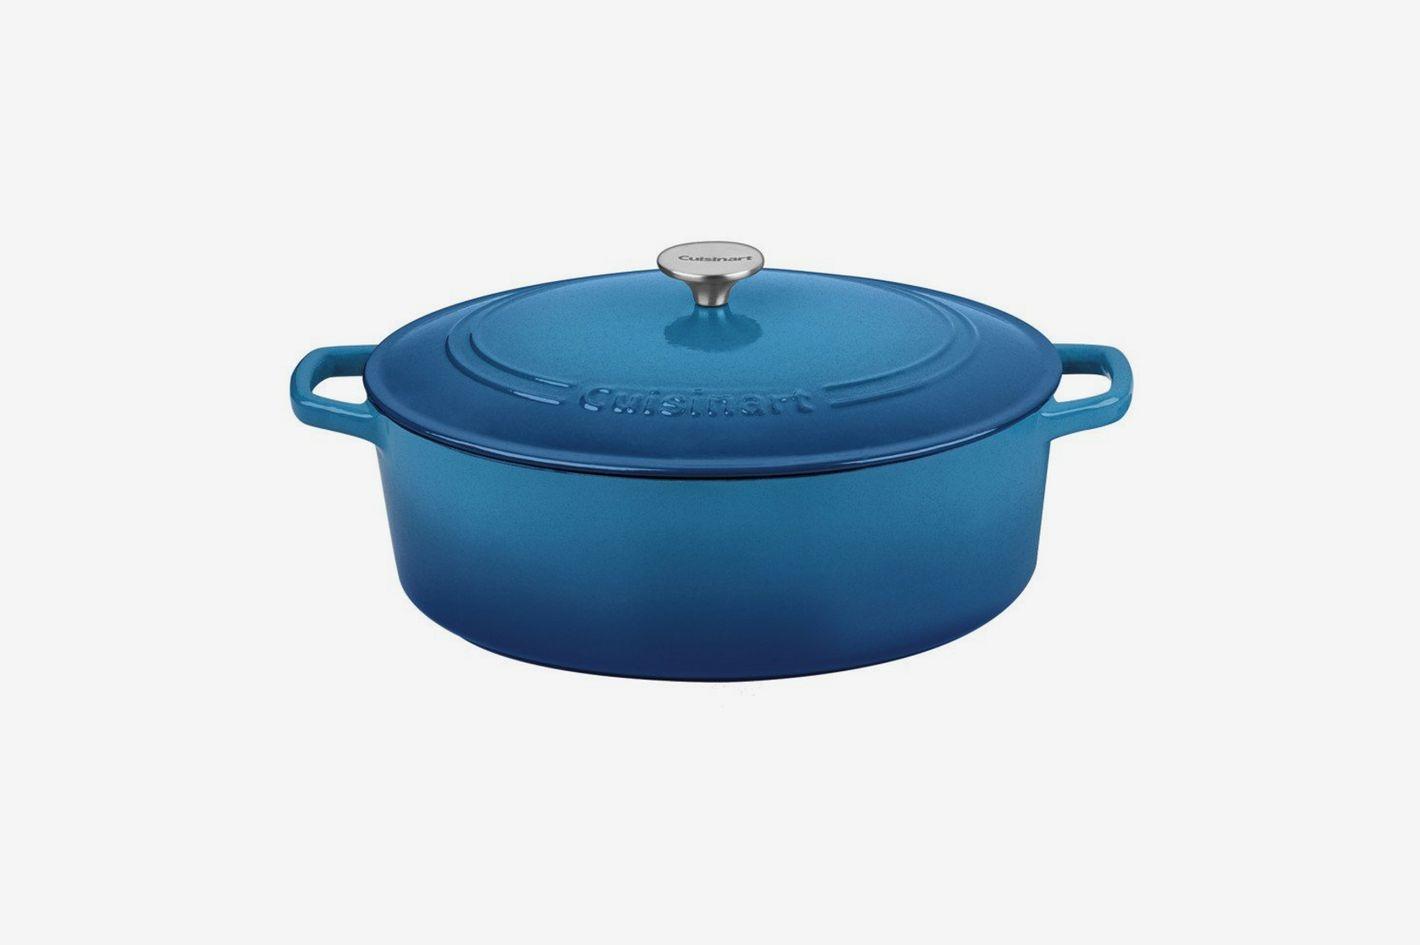 Cuisinart Oval Casserole, Gradient Blue, 7-Qt.